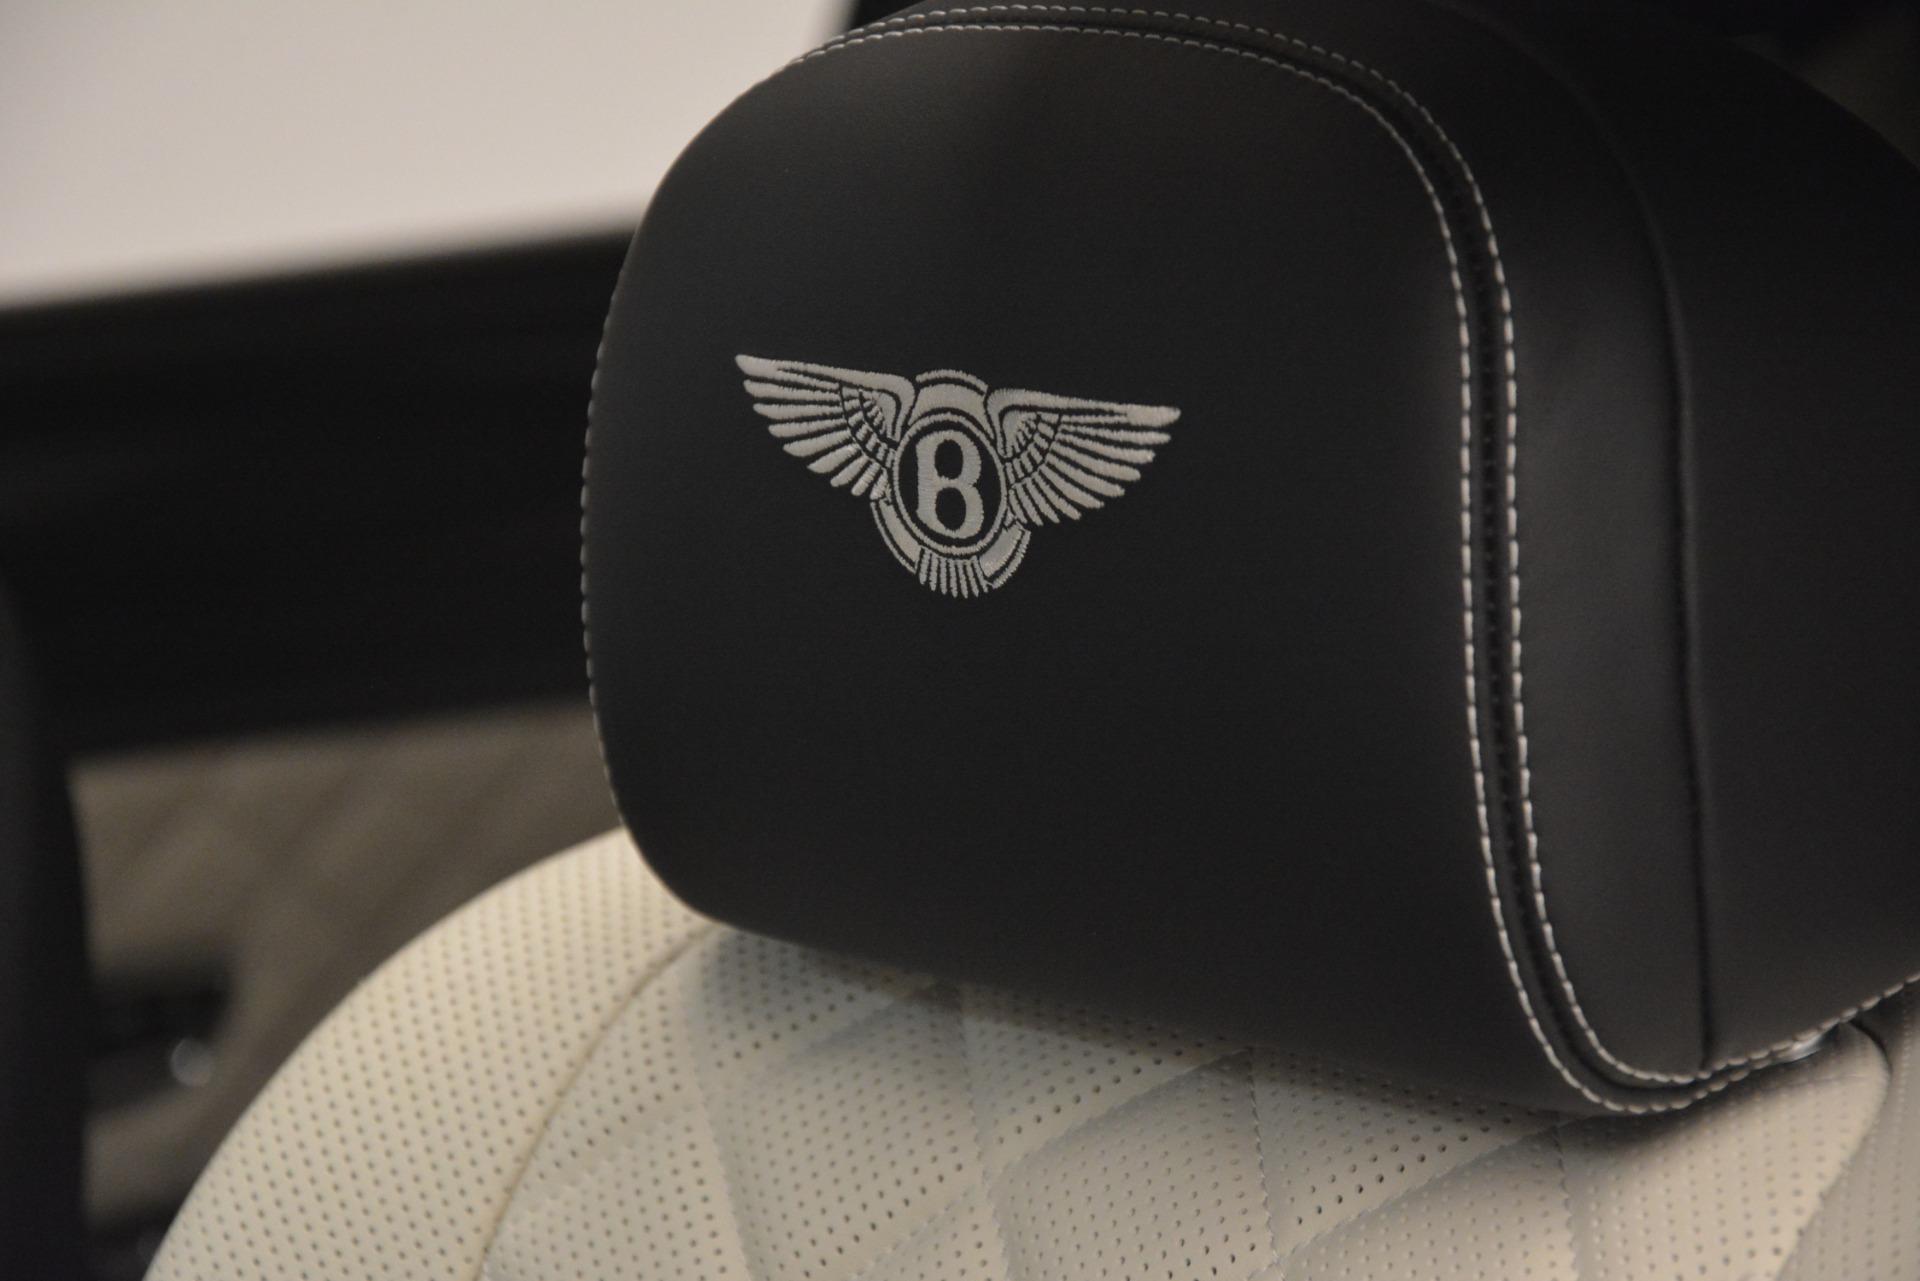 Used 2018 Bentley Flying Spur W12 S For Sale In Westport, CT 3014_p21